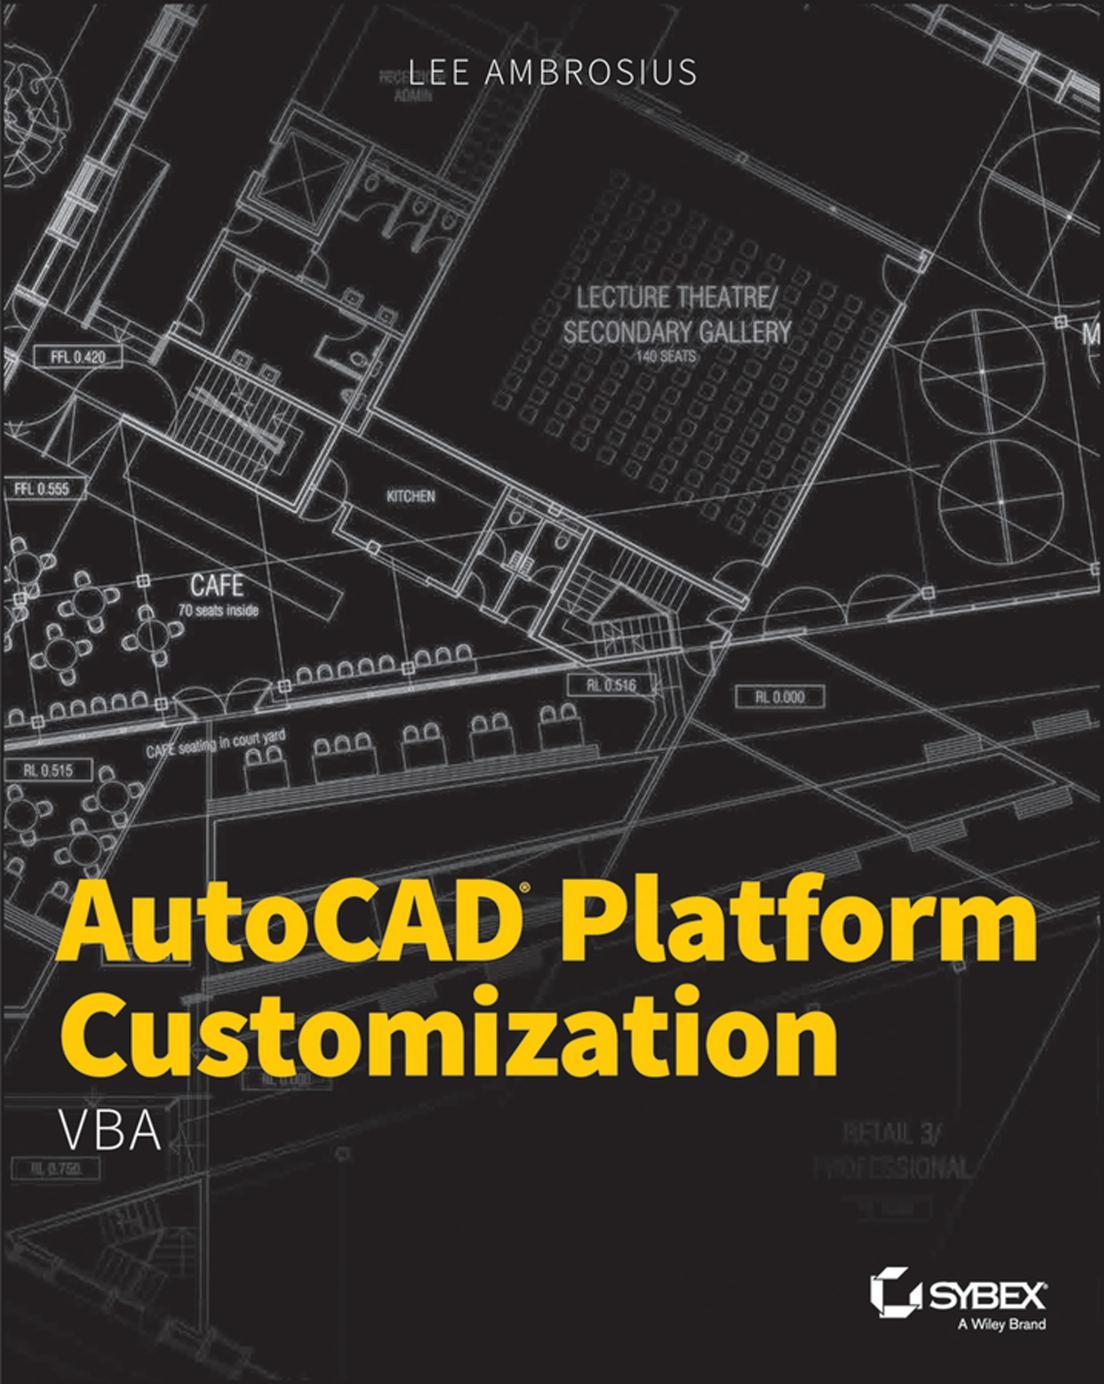 AutoCAD Platform Customization VBA (PDF)